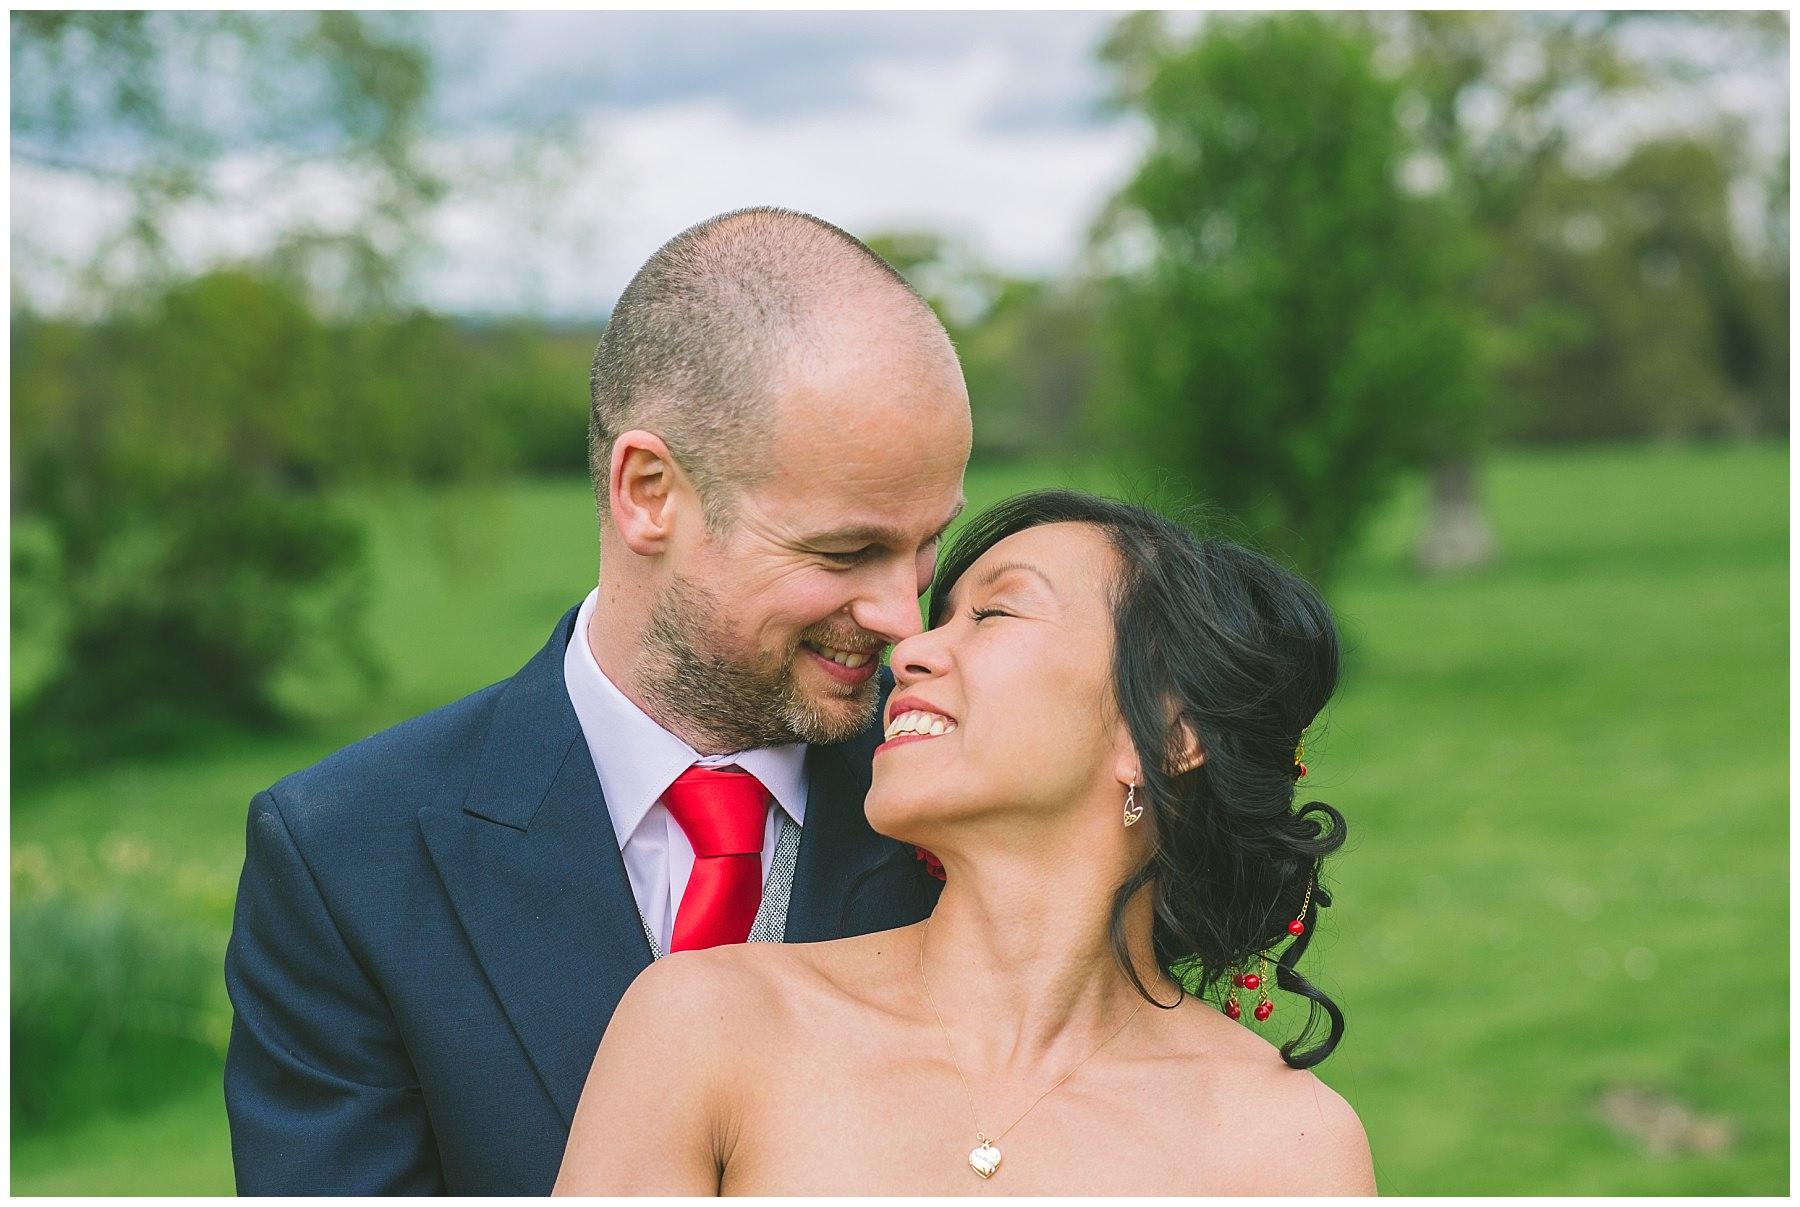 Couples portraits at Pentre Mawr